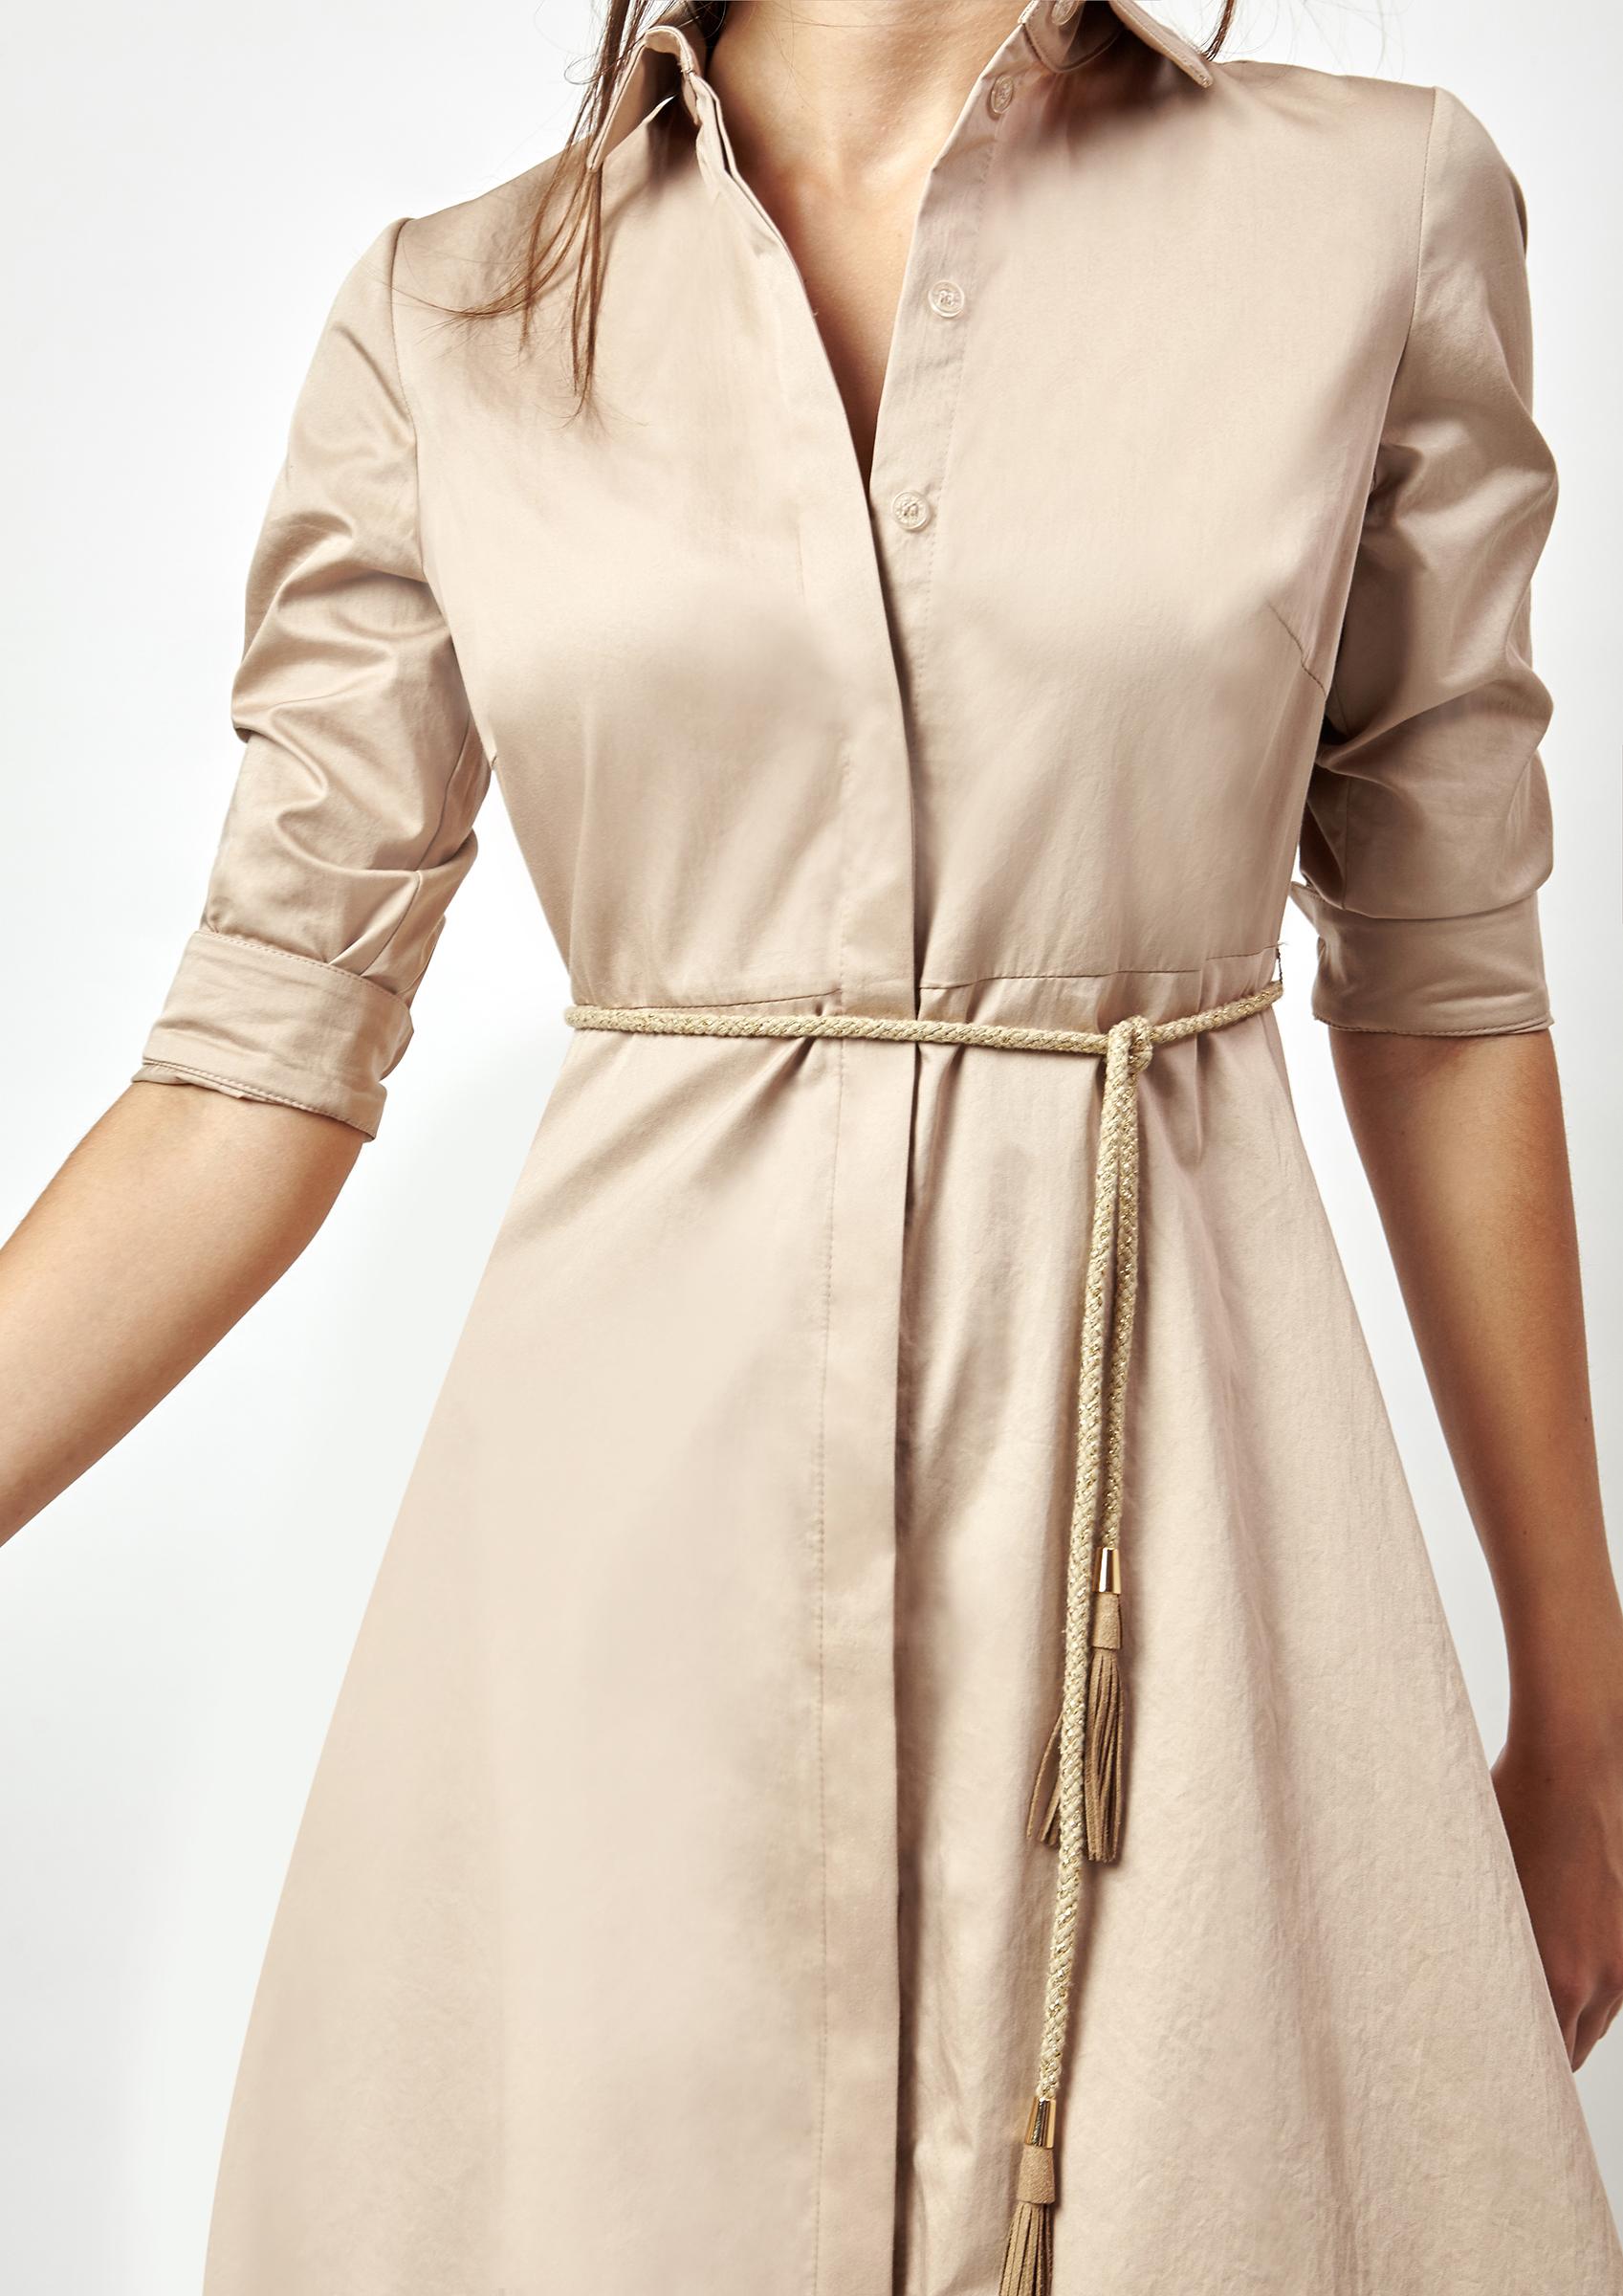 5631c8a04f Vestido camisero mujer color beige